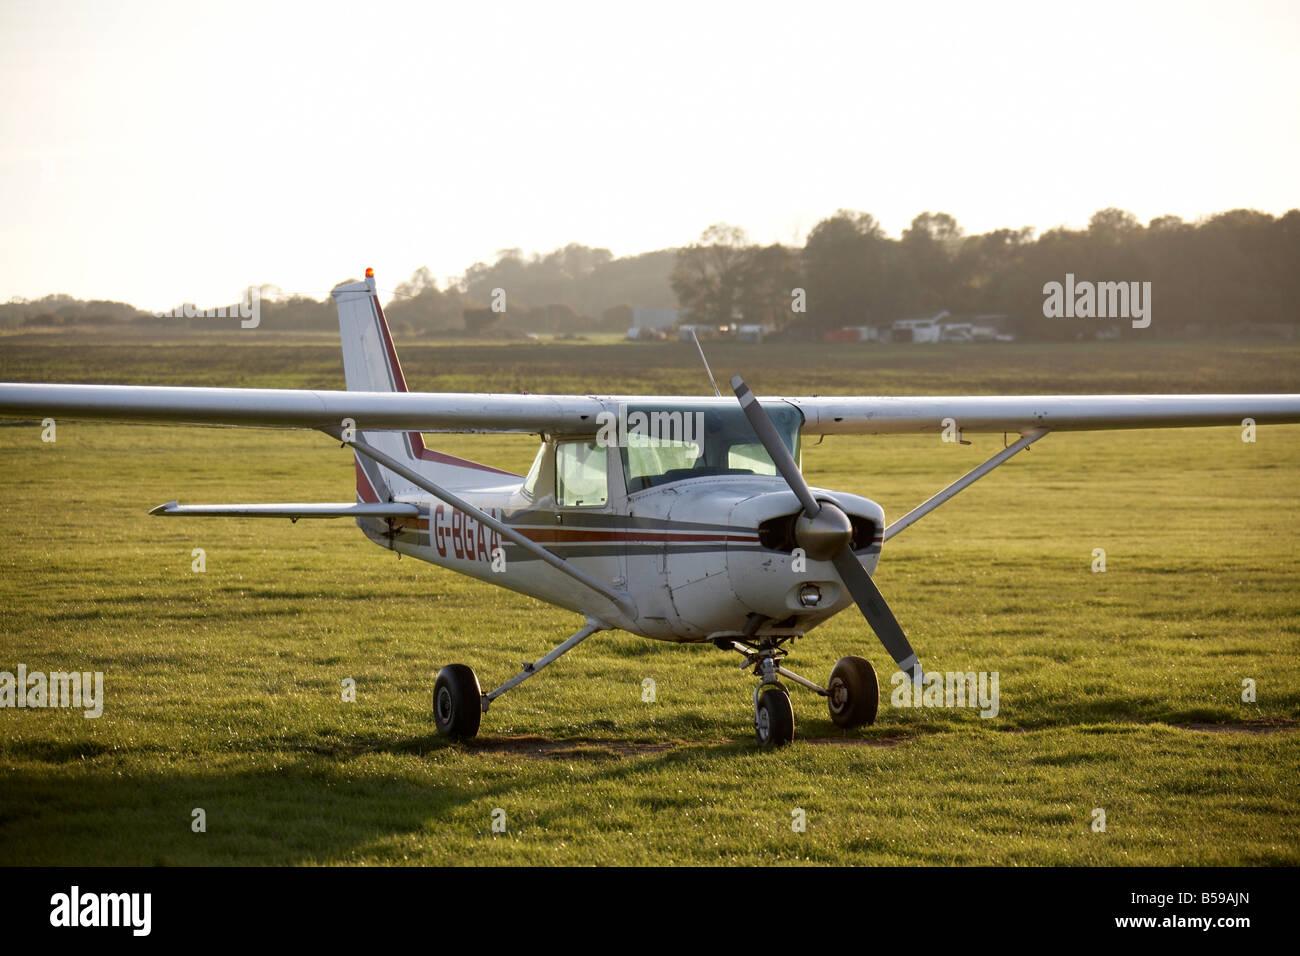 View of aeroplane G BGAA on grass Stapleford Tawney Aerodrome Romford Epping Forest London RM4 England UK - Stock Image